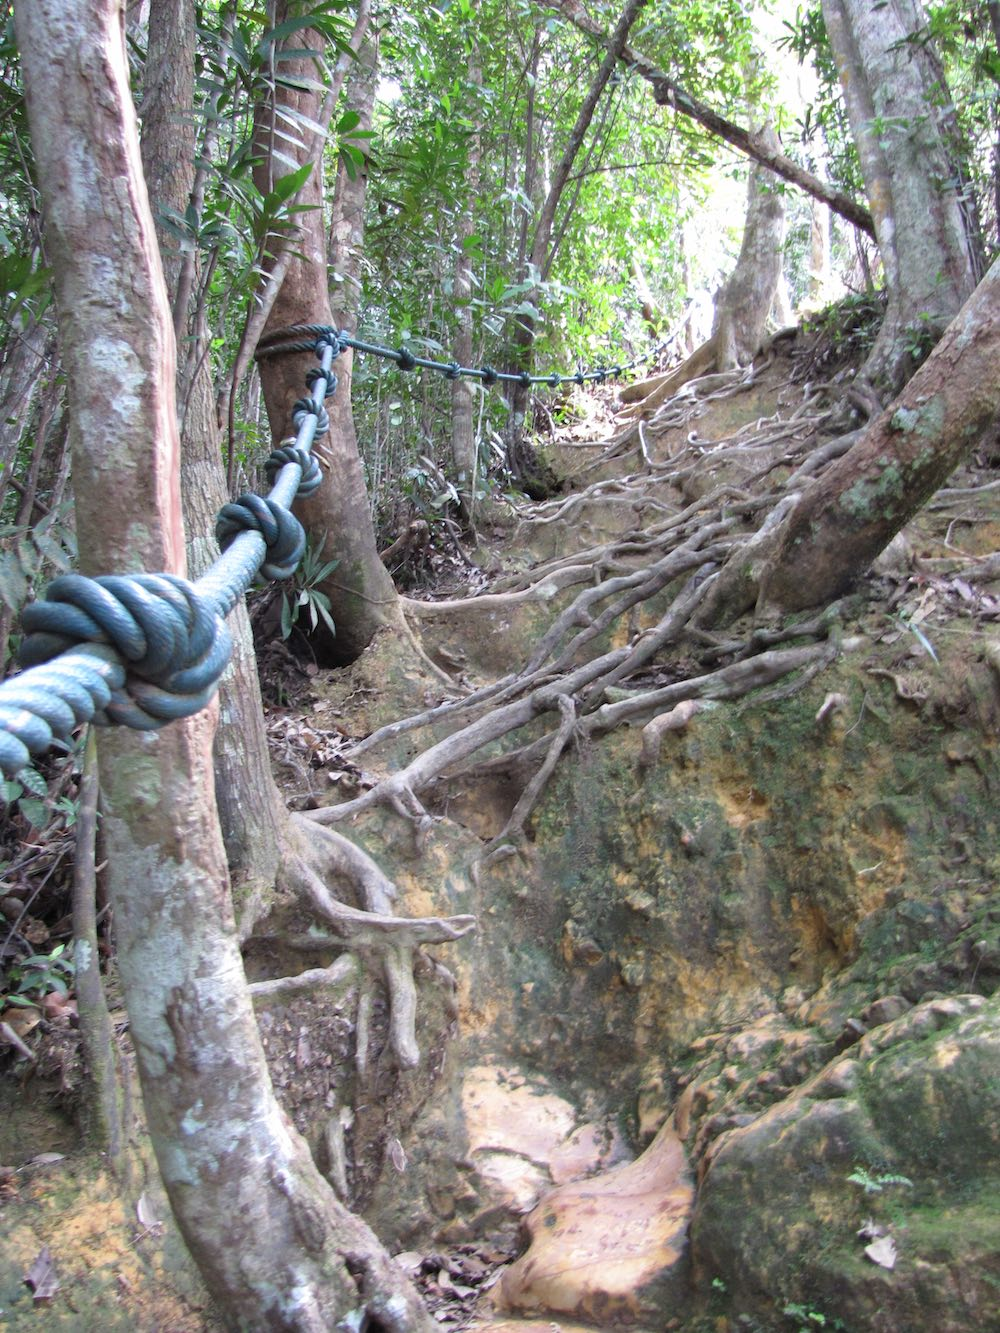 rope handhold for steep jungle trail, Mount Santubong, Sarawak, Malaysia